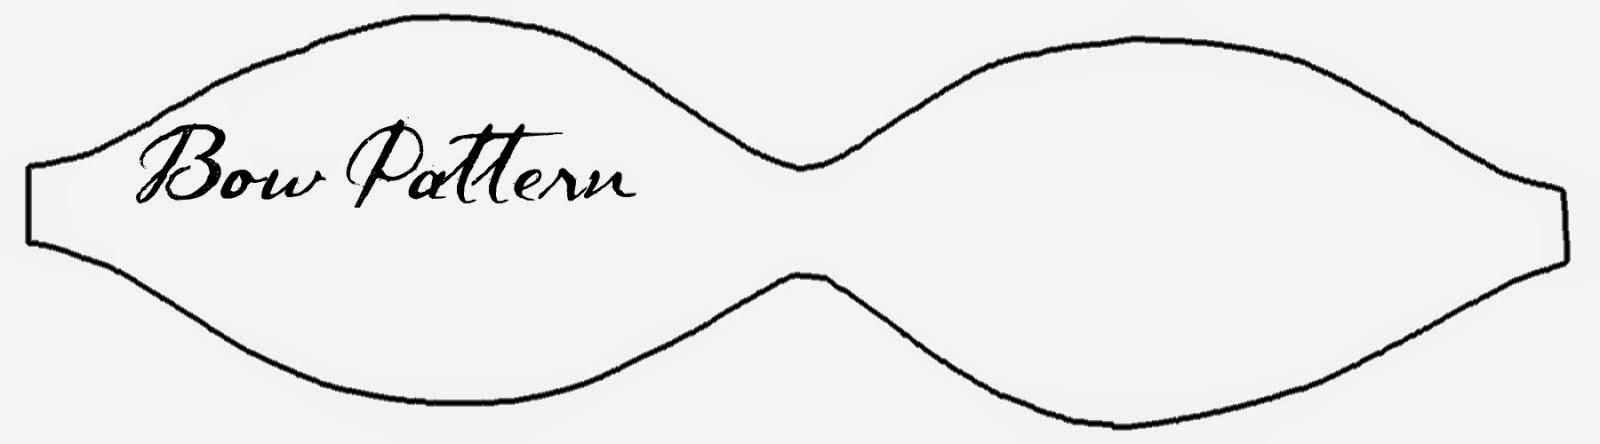 Printable Bow Tie Template  Elioleracom